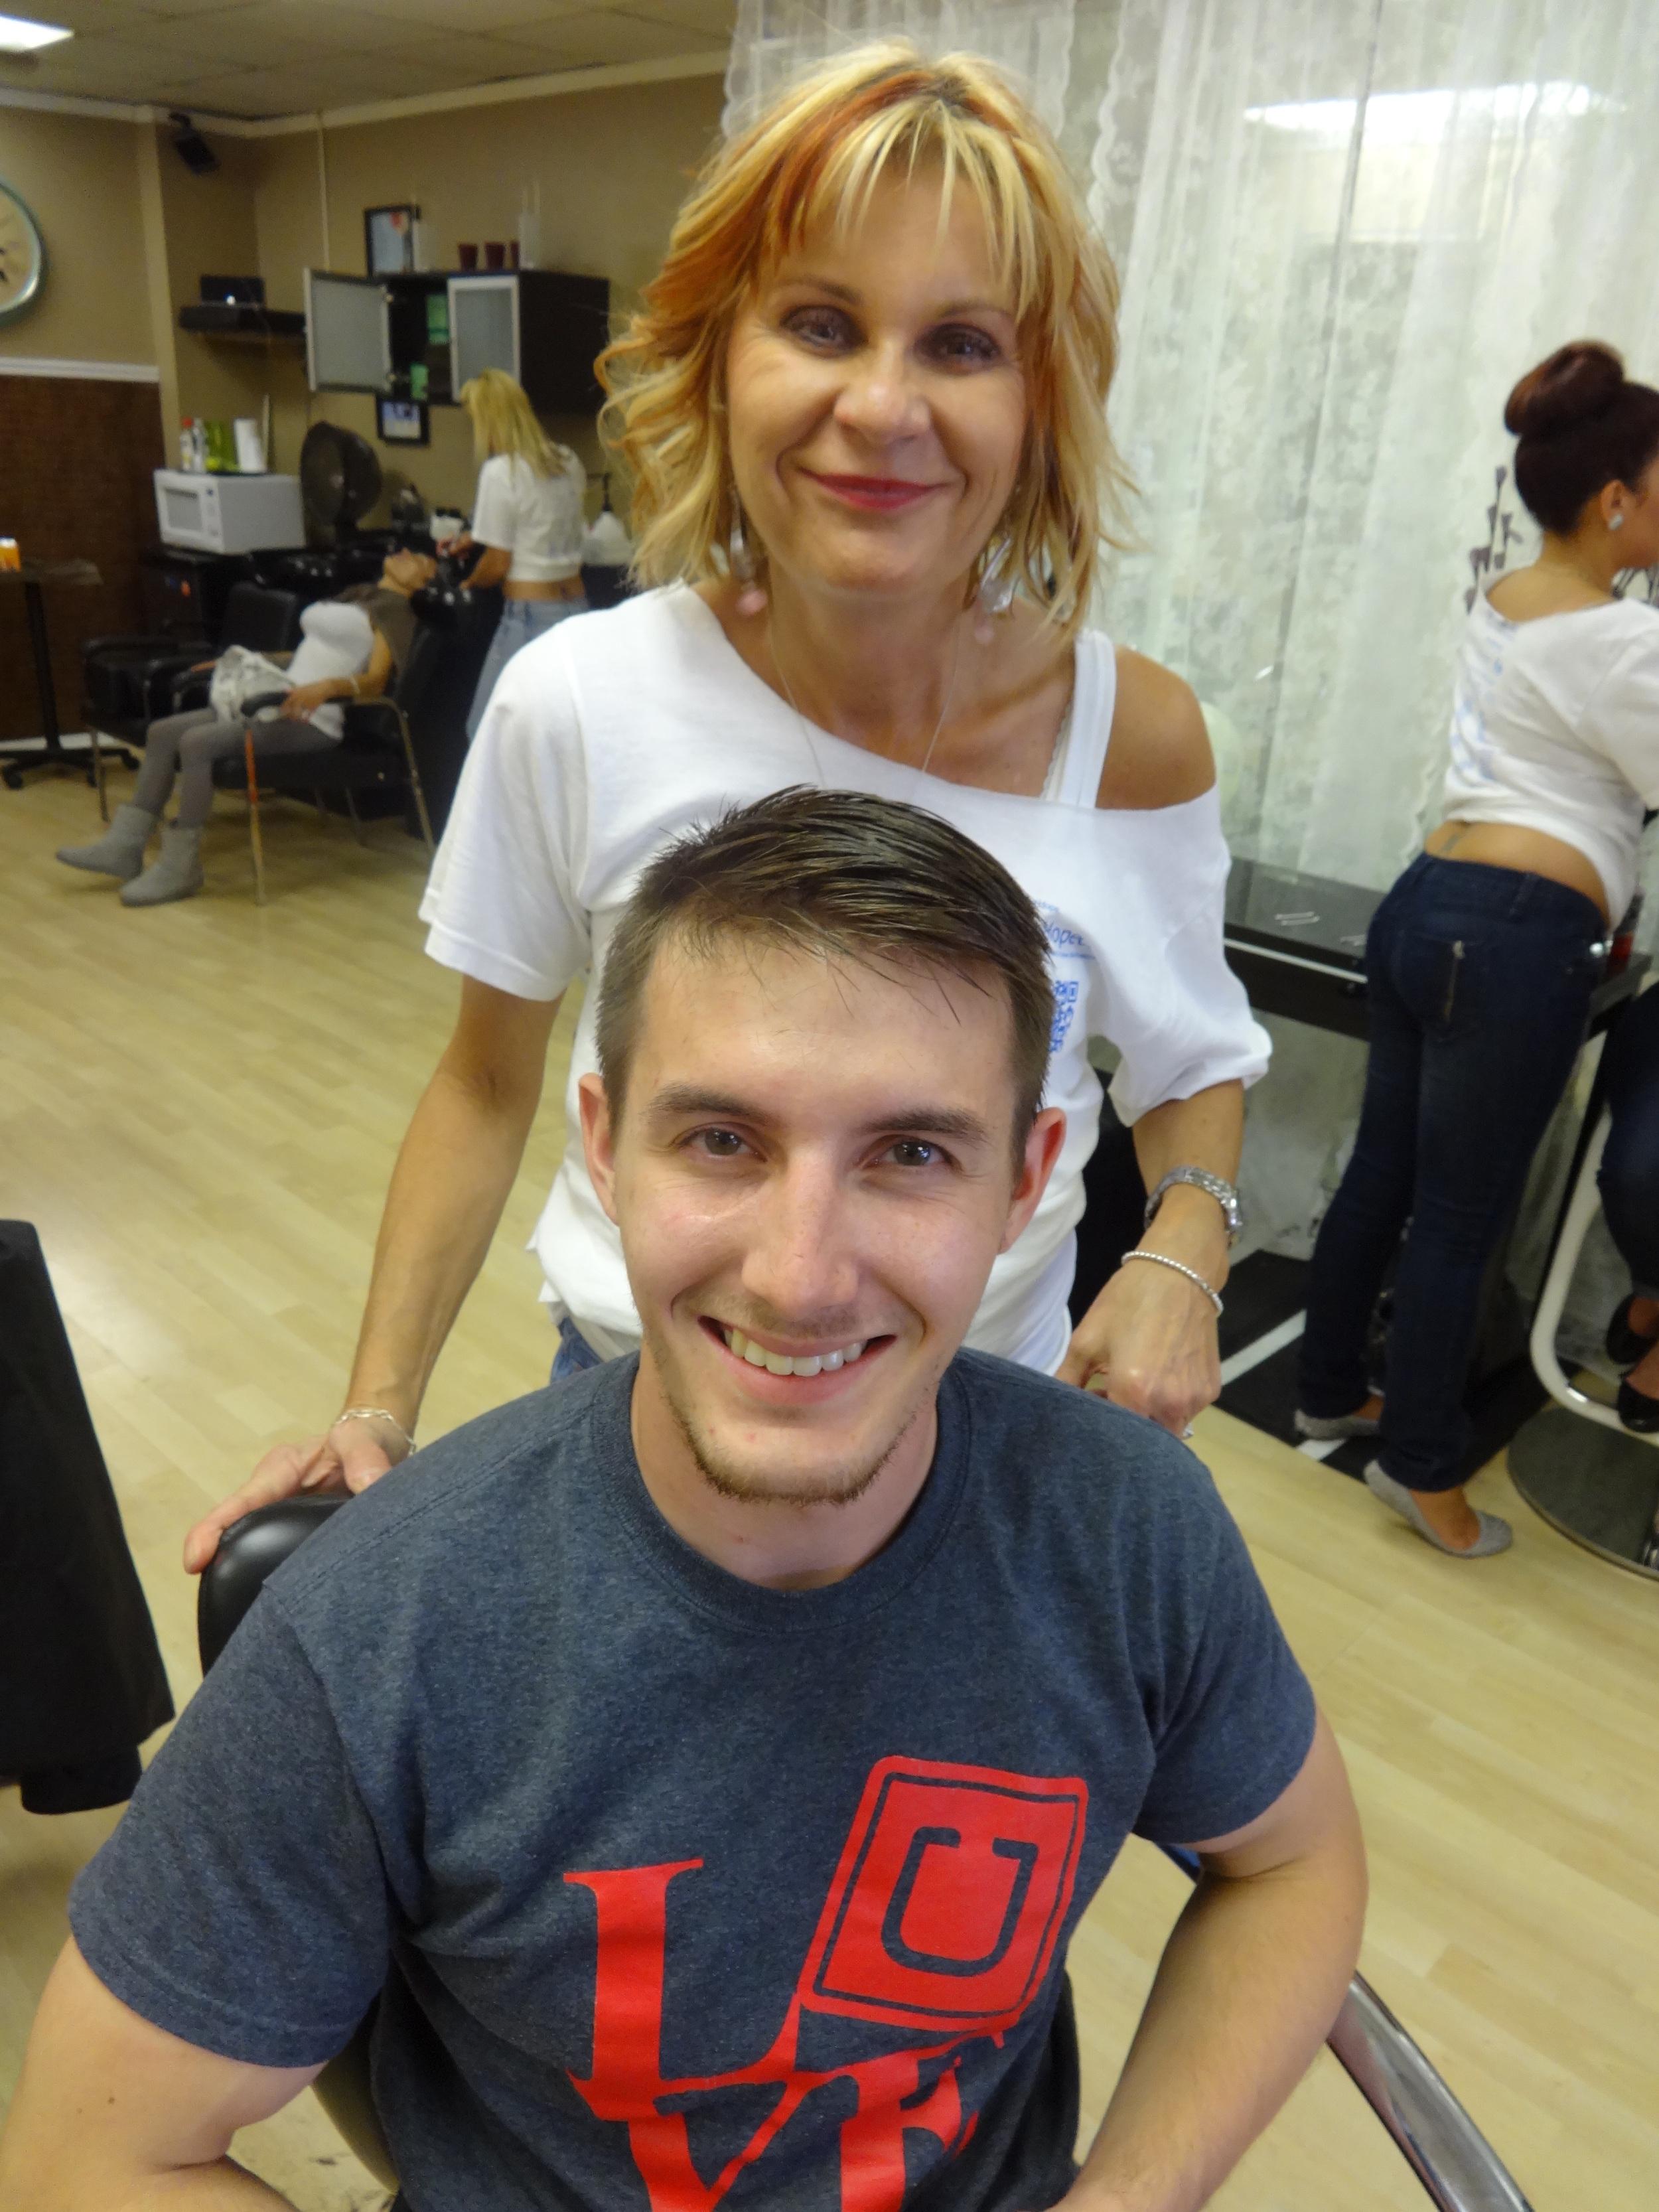 hopecuts, city of hope, headhunters hair salon, east passyunk